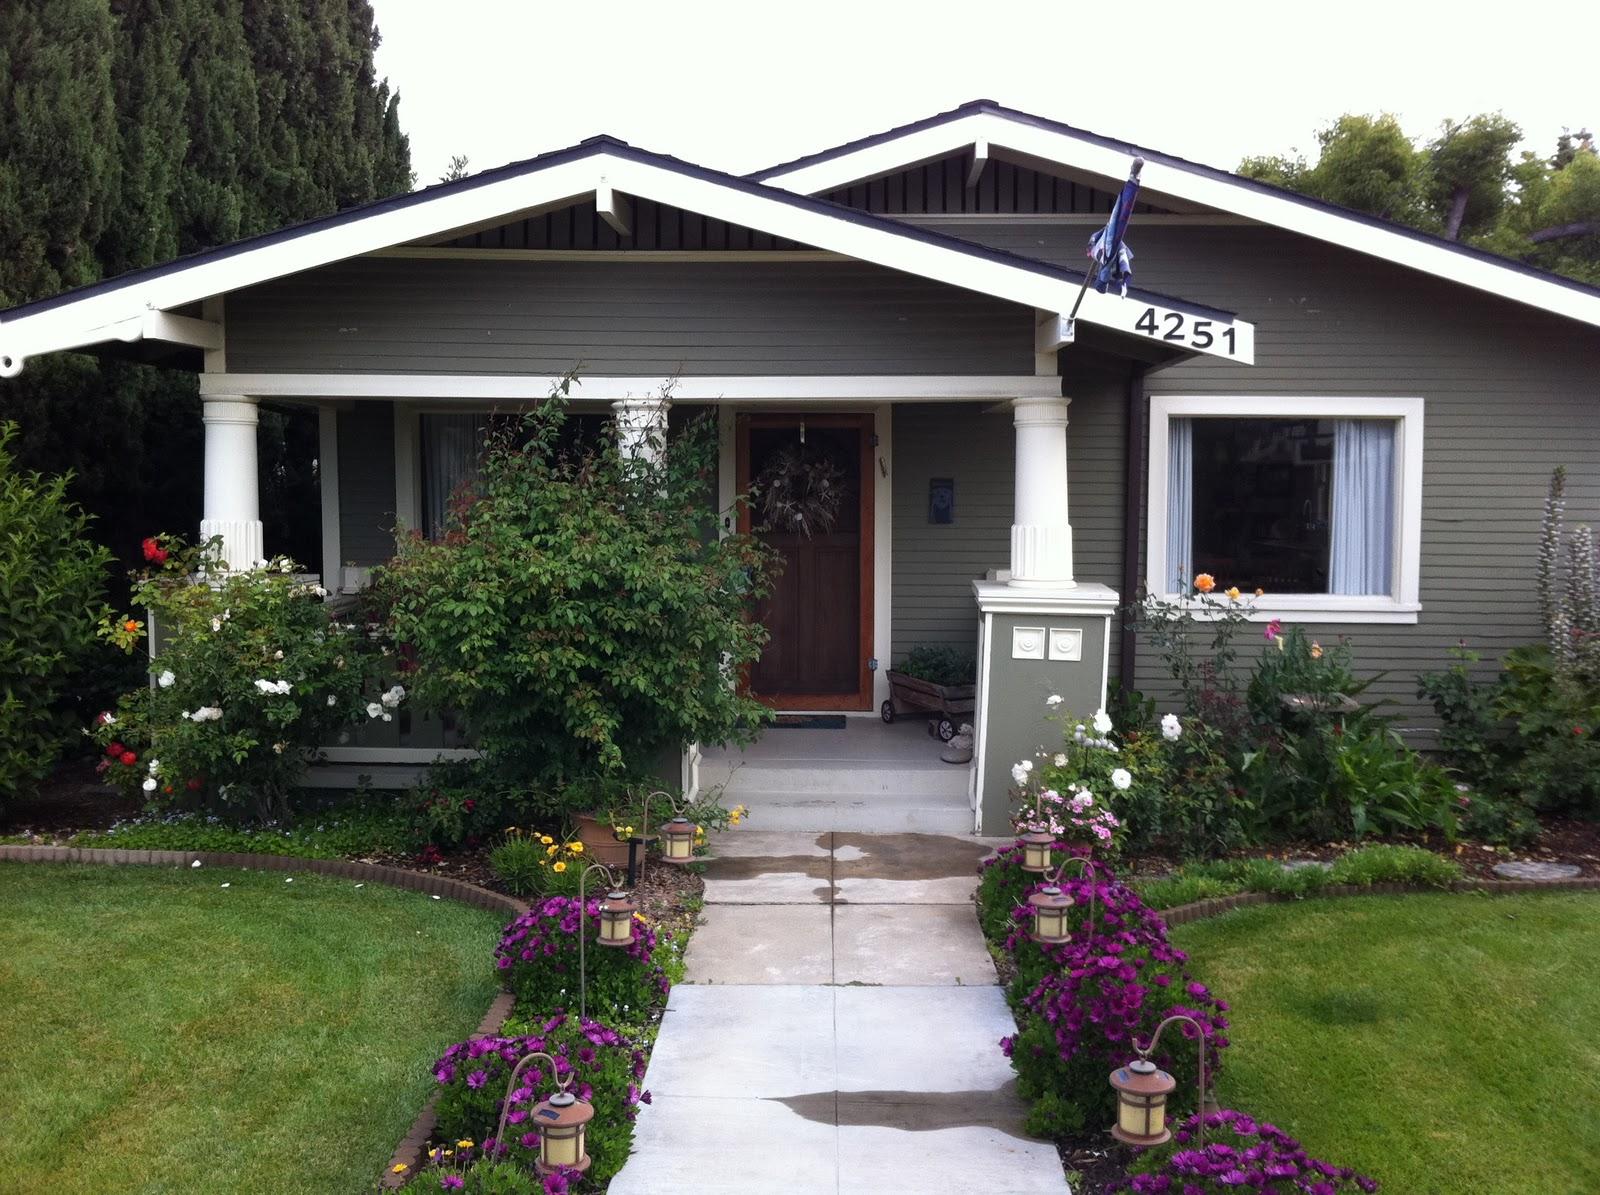 Craftsman style porch columns - Craftsman Style Front Porch Front Porch Designs Bungalow Enclosed 1024x768 Craftsman